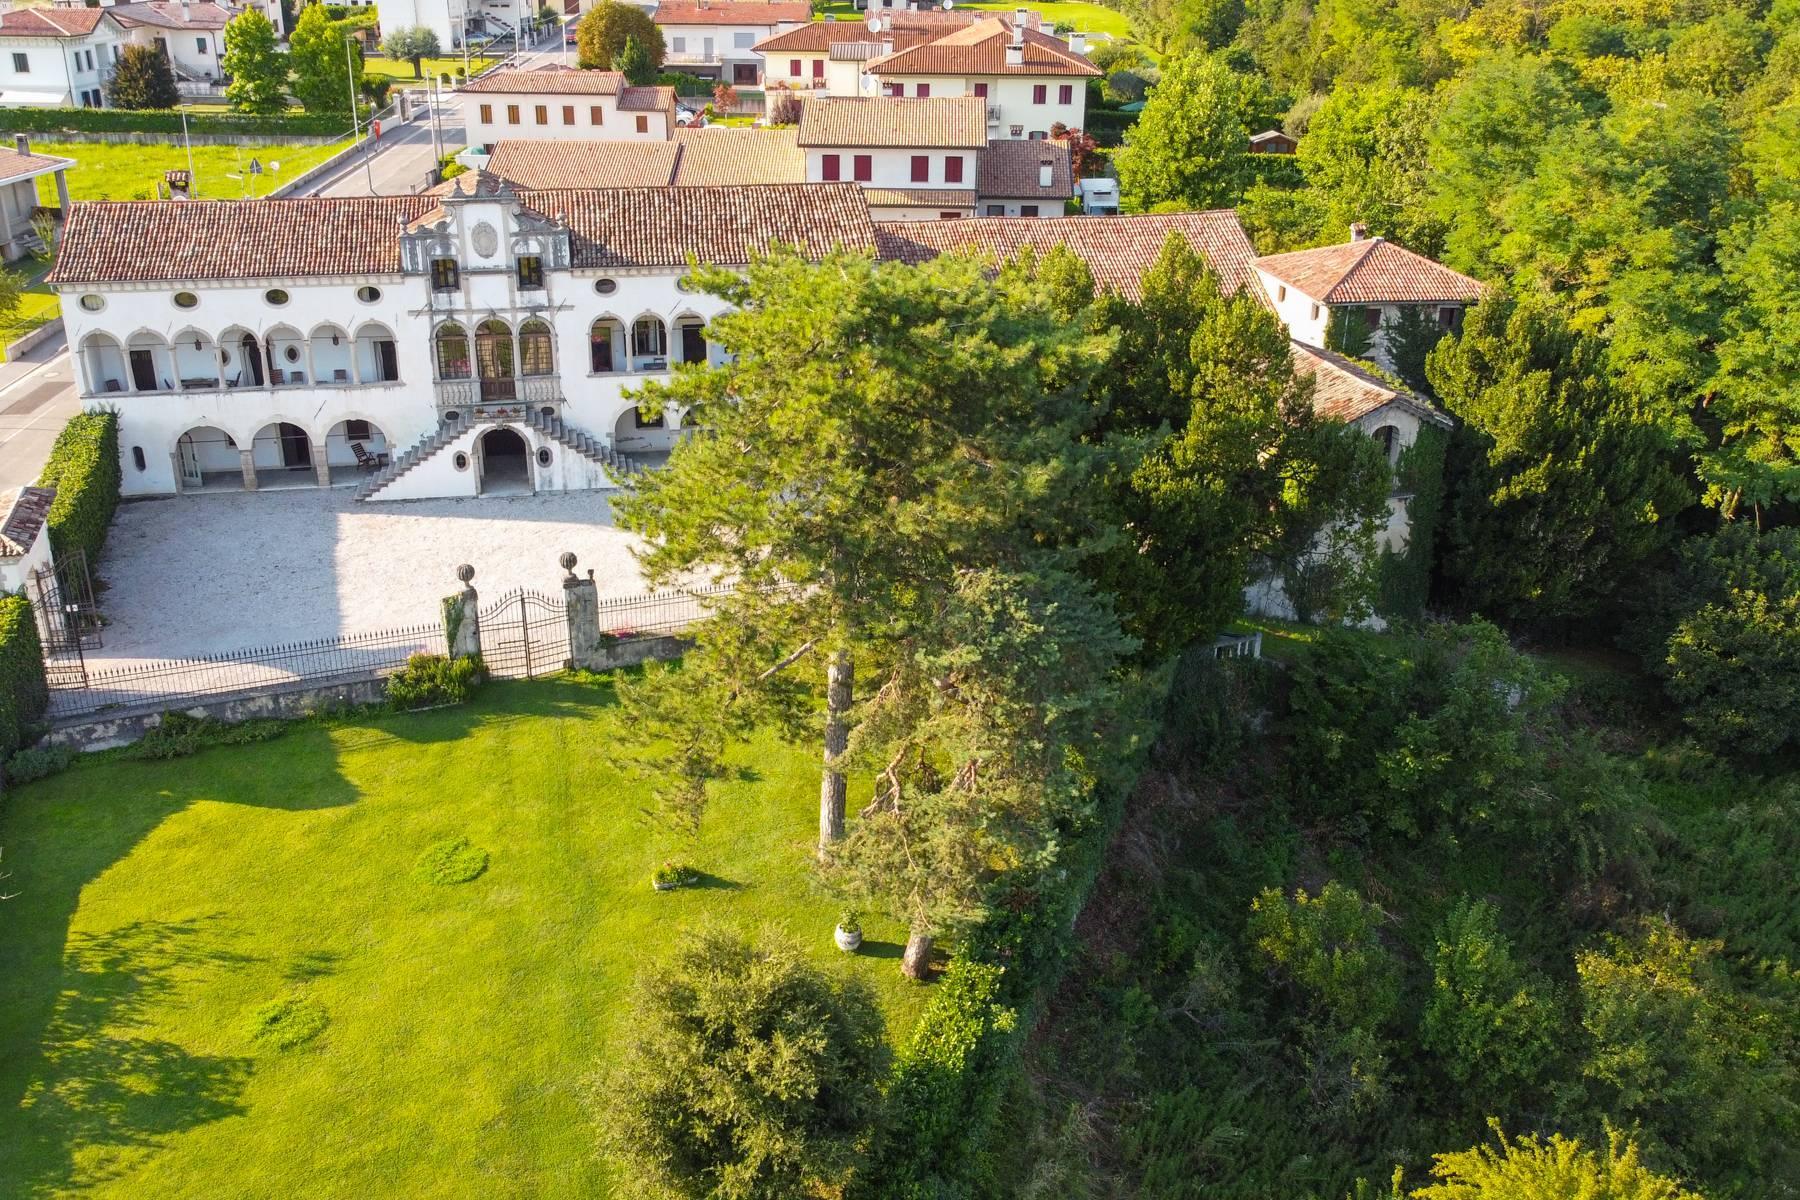 Elegant 17th century Venetian Villa with park on the hills of Treviso - 36